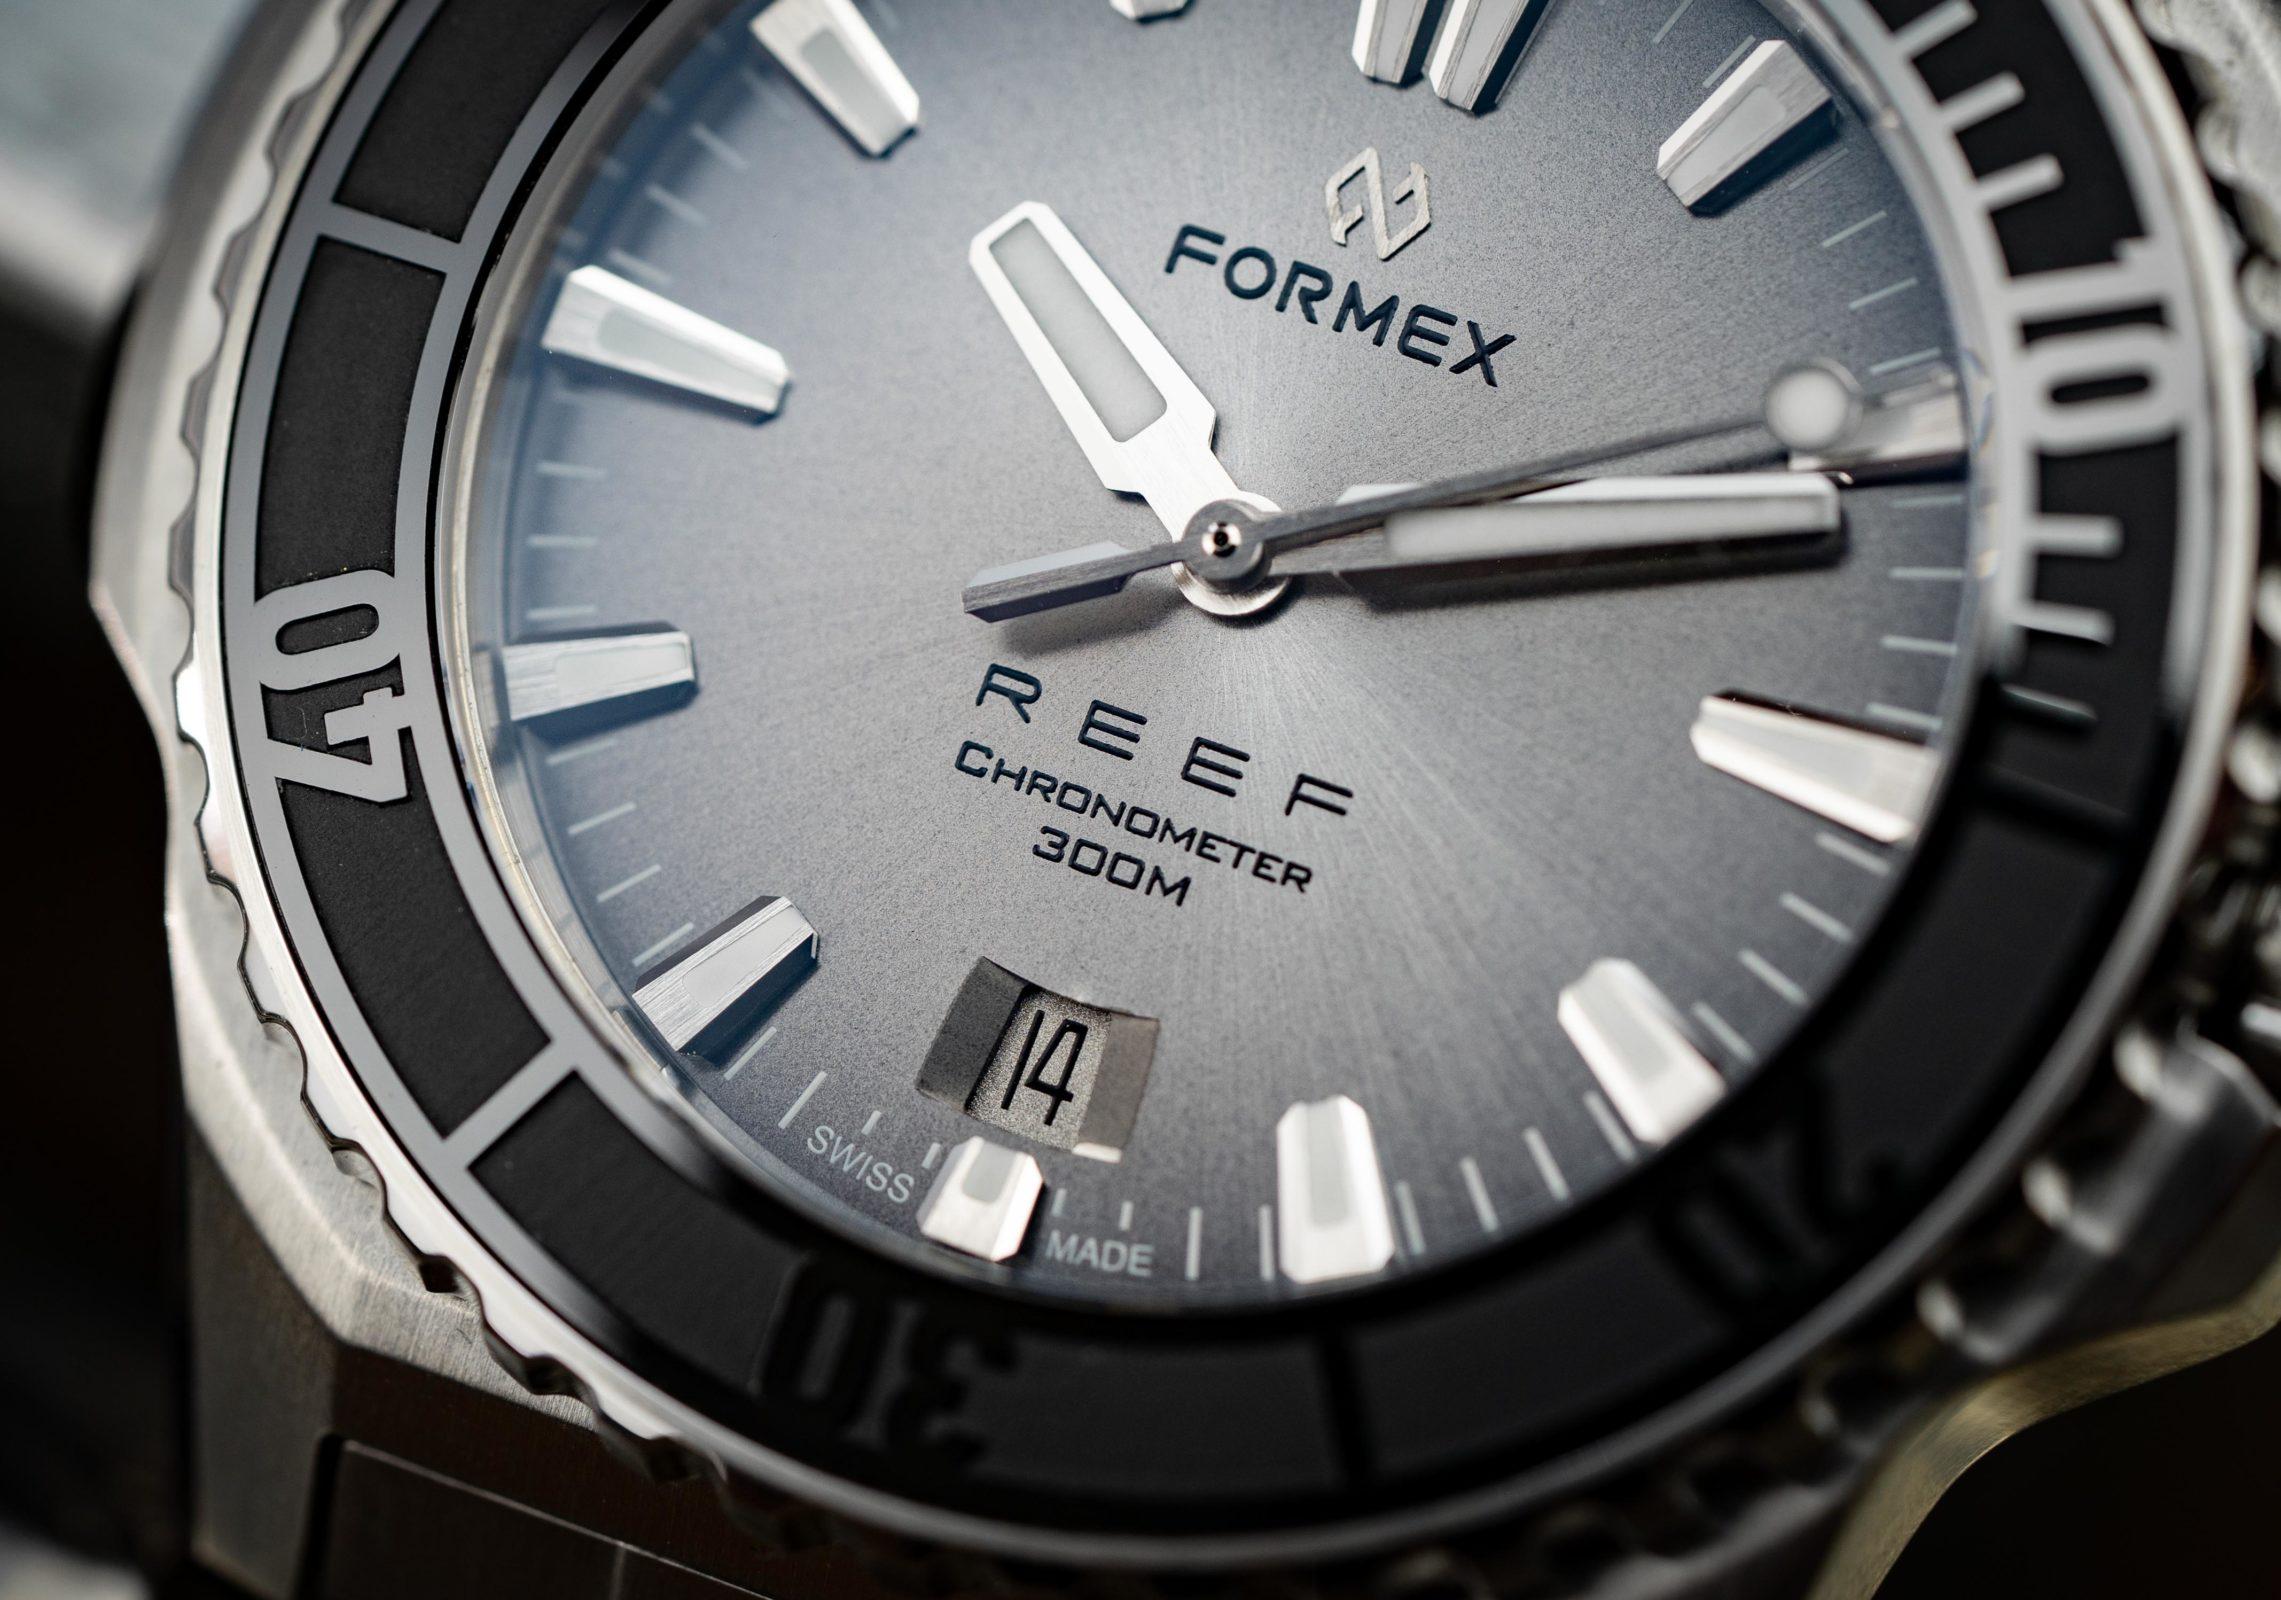 Formex-Reef-Automatik-Chronometer-300m-Test-Review